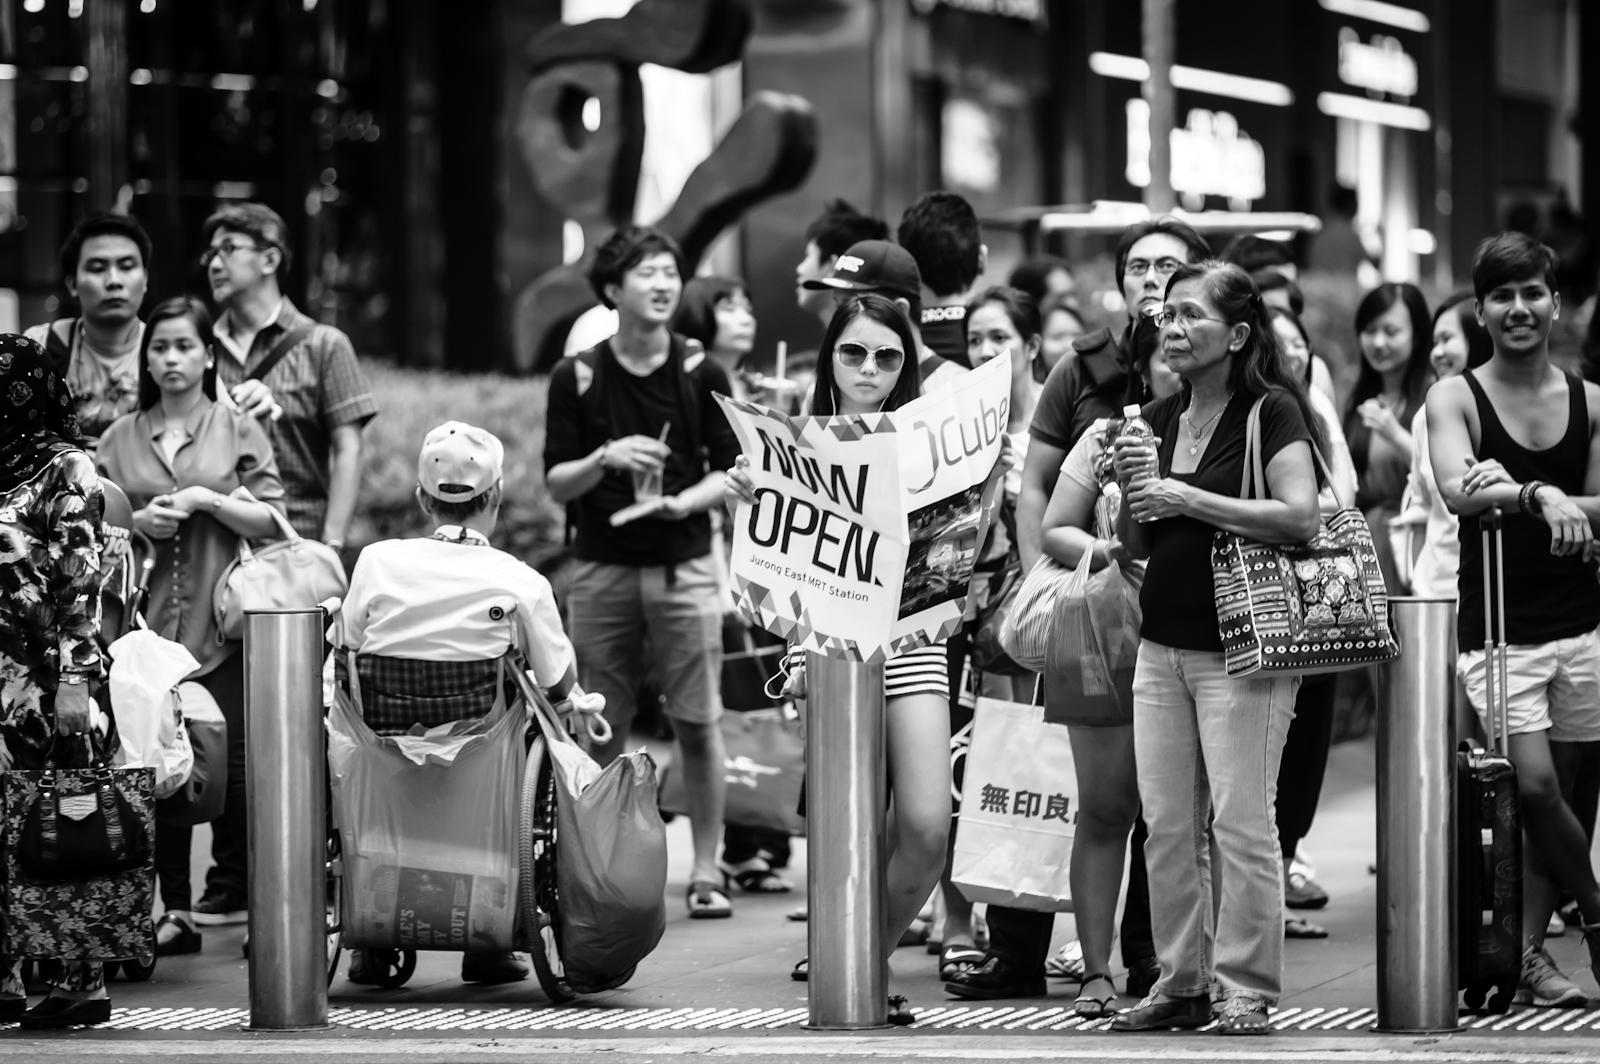 Street photography - Publicity stunt